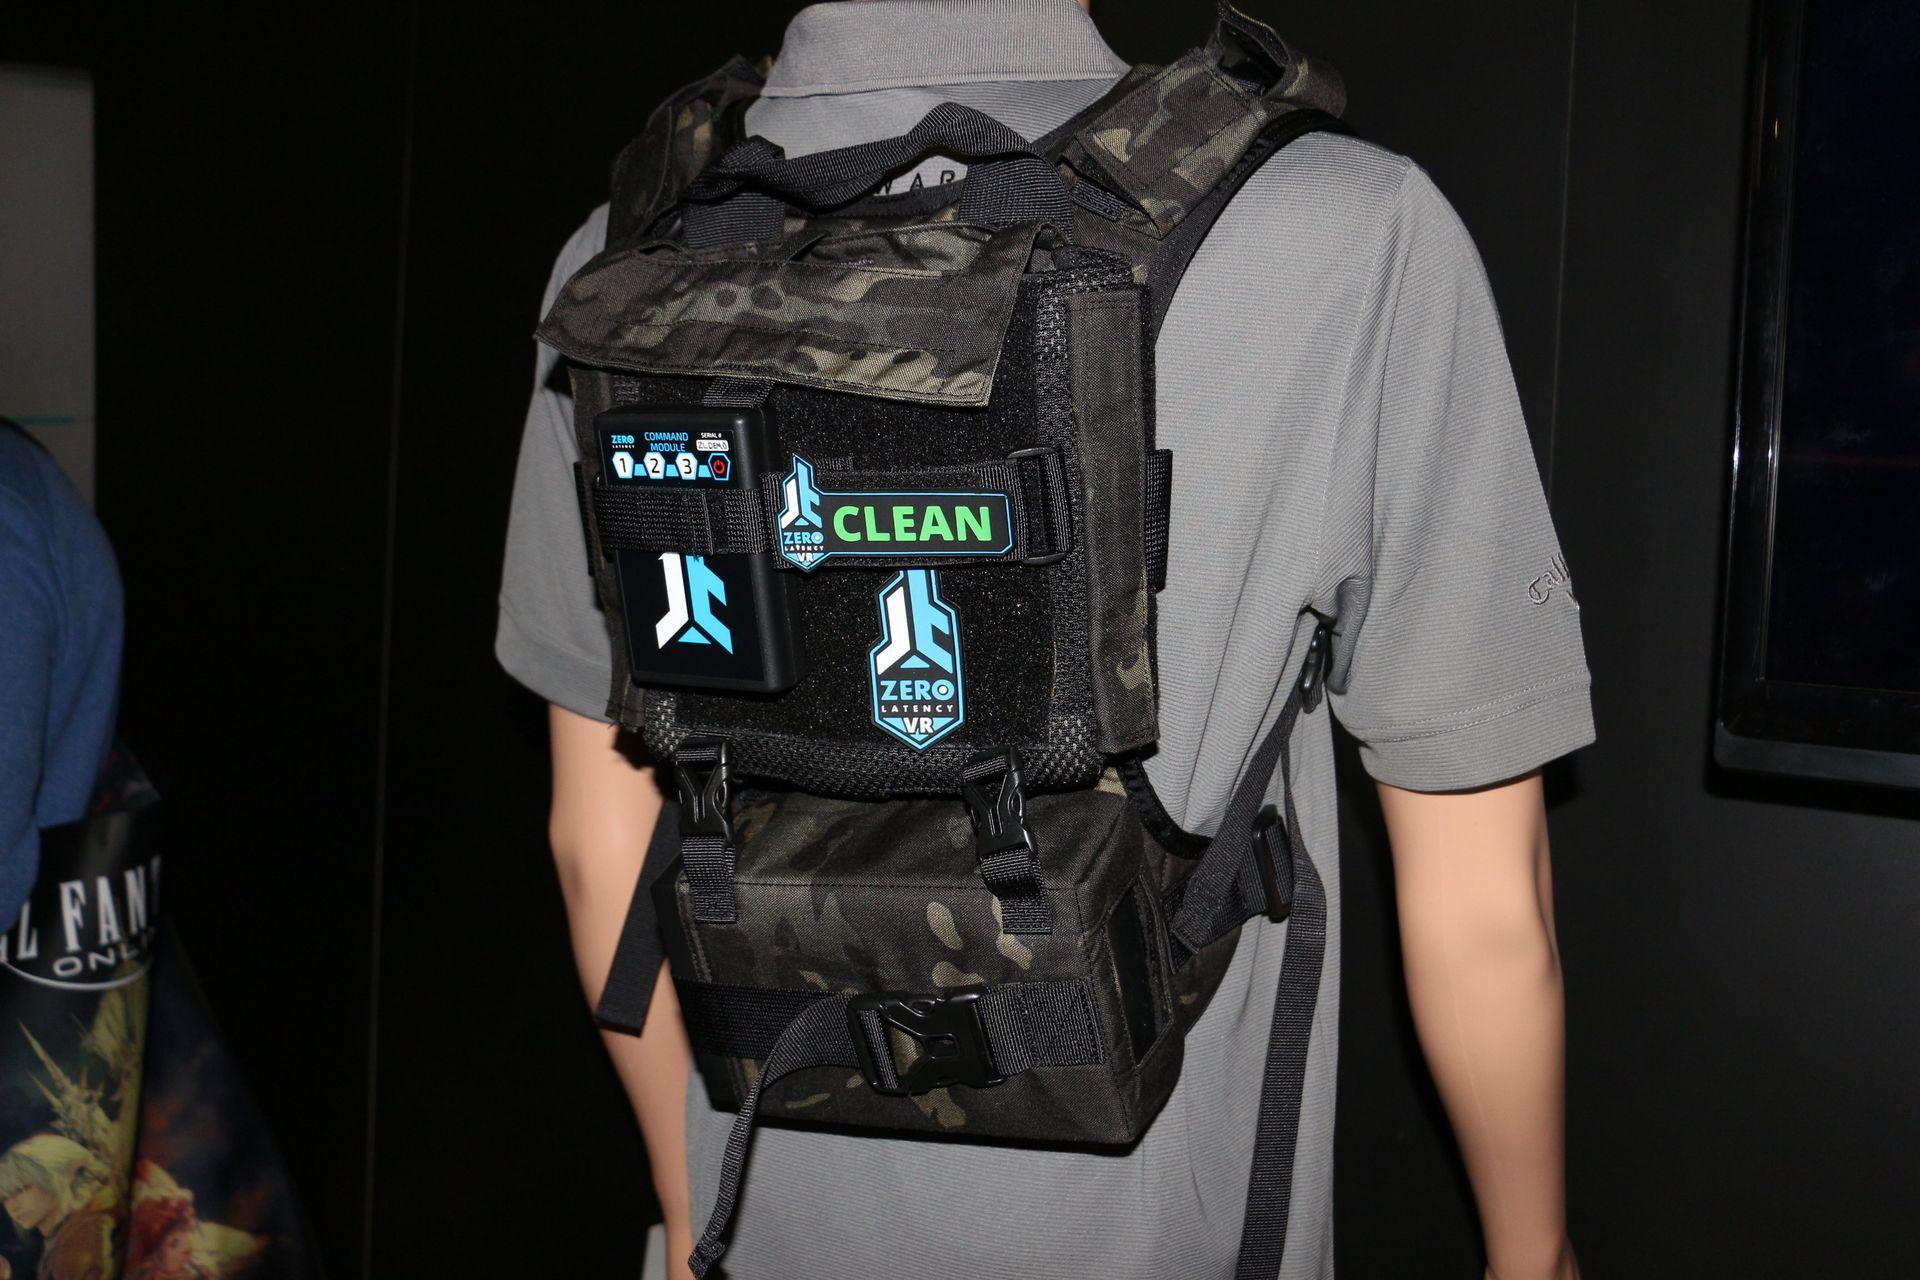 Zero LatencyのVR用バックパック。上部に「ALIENWARE Alpha」を装着する